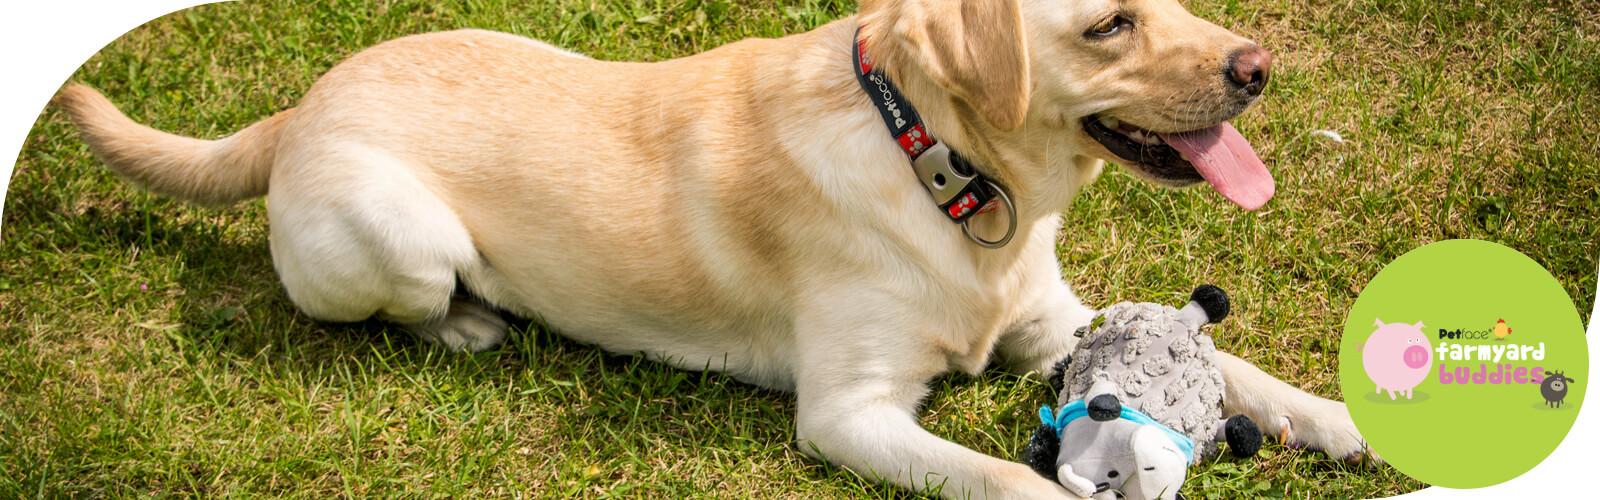 Farmyard Buddies -  Speelgoed voor honden